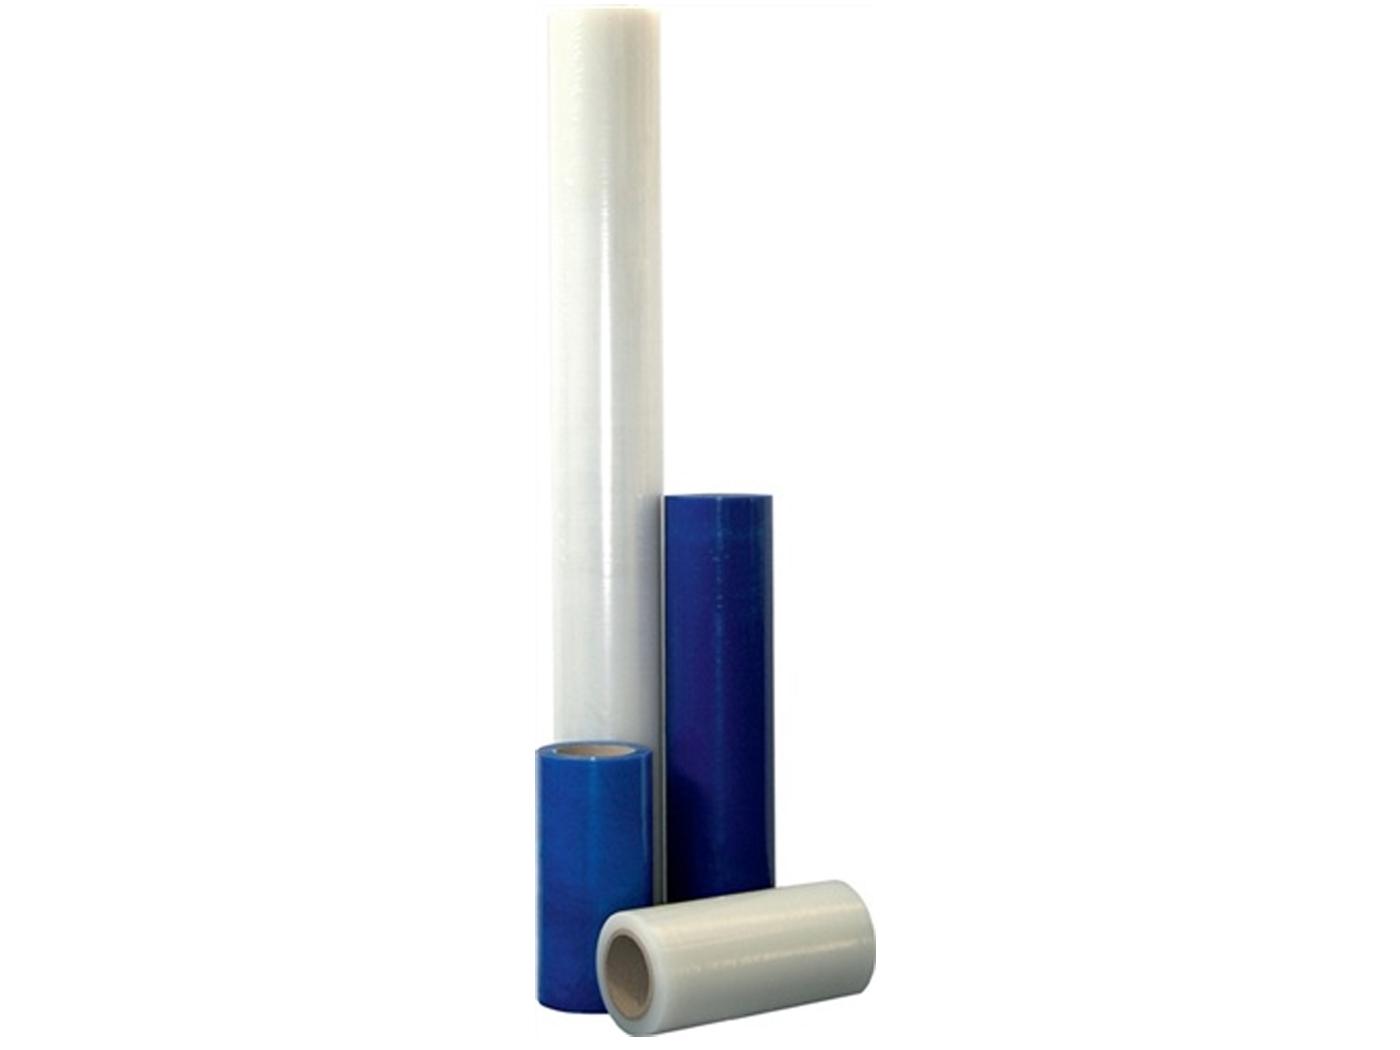 Beschermfolie voor glas blauw transparant | DKMTools - DKM Tools